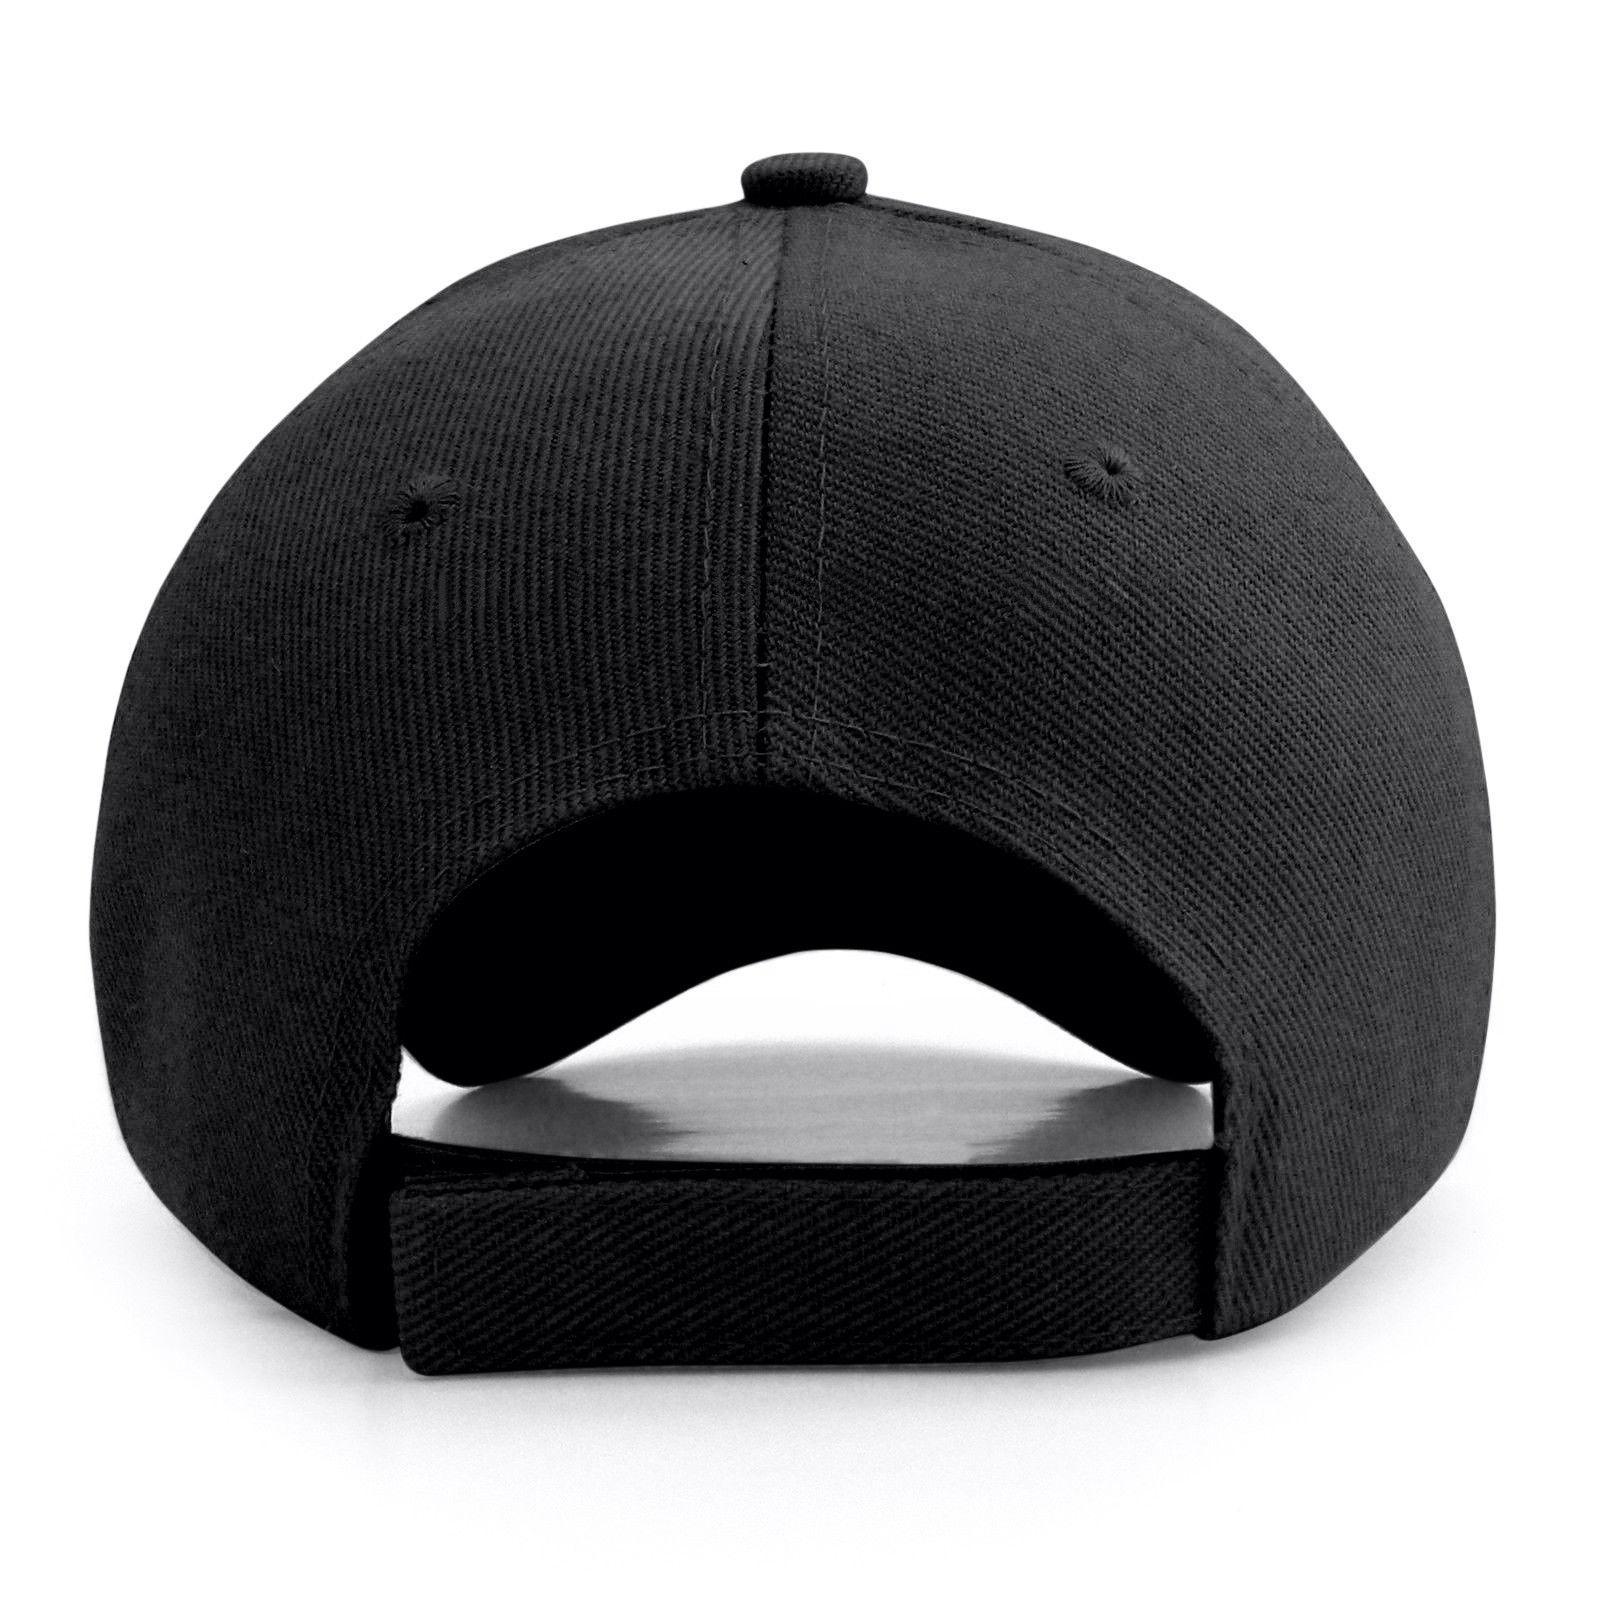 Plain Baseball Cap Solid Color Blank Visor Hat New